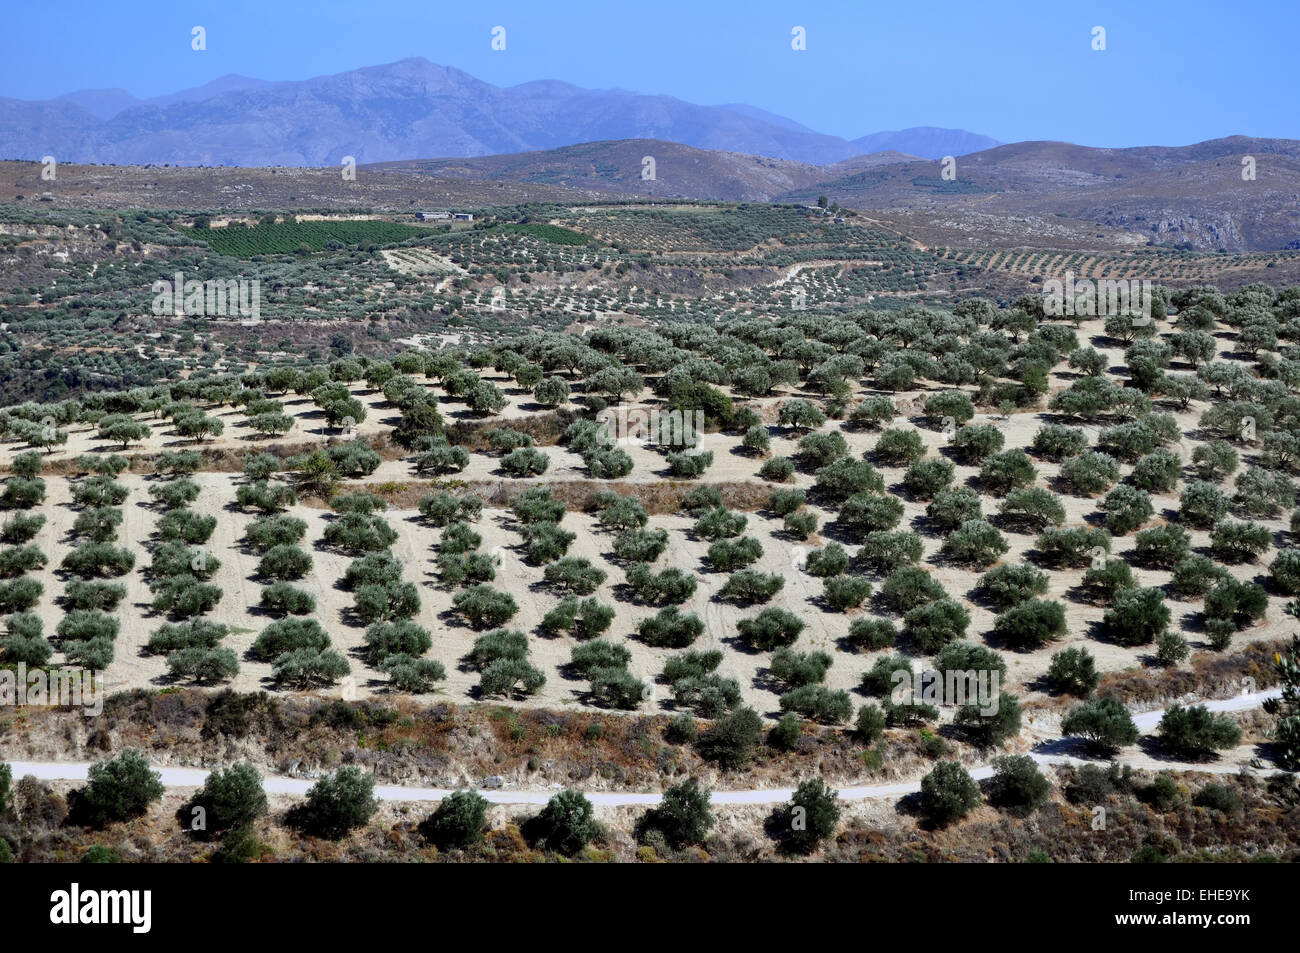 Agriculture in Crete, Greece. Stock Photo